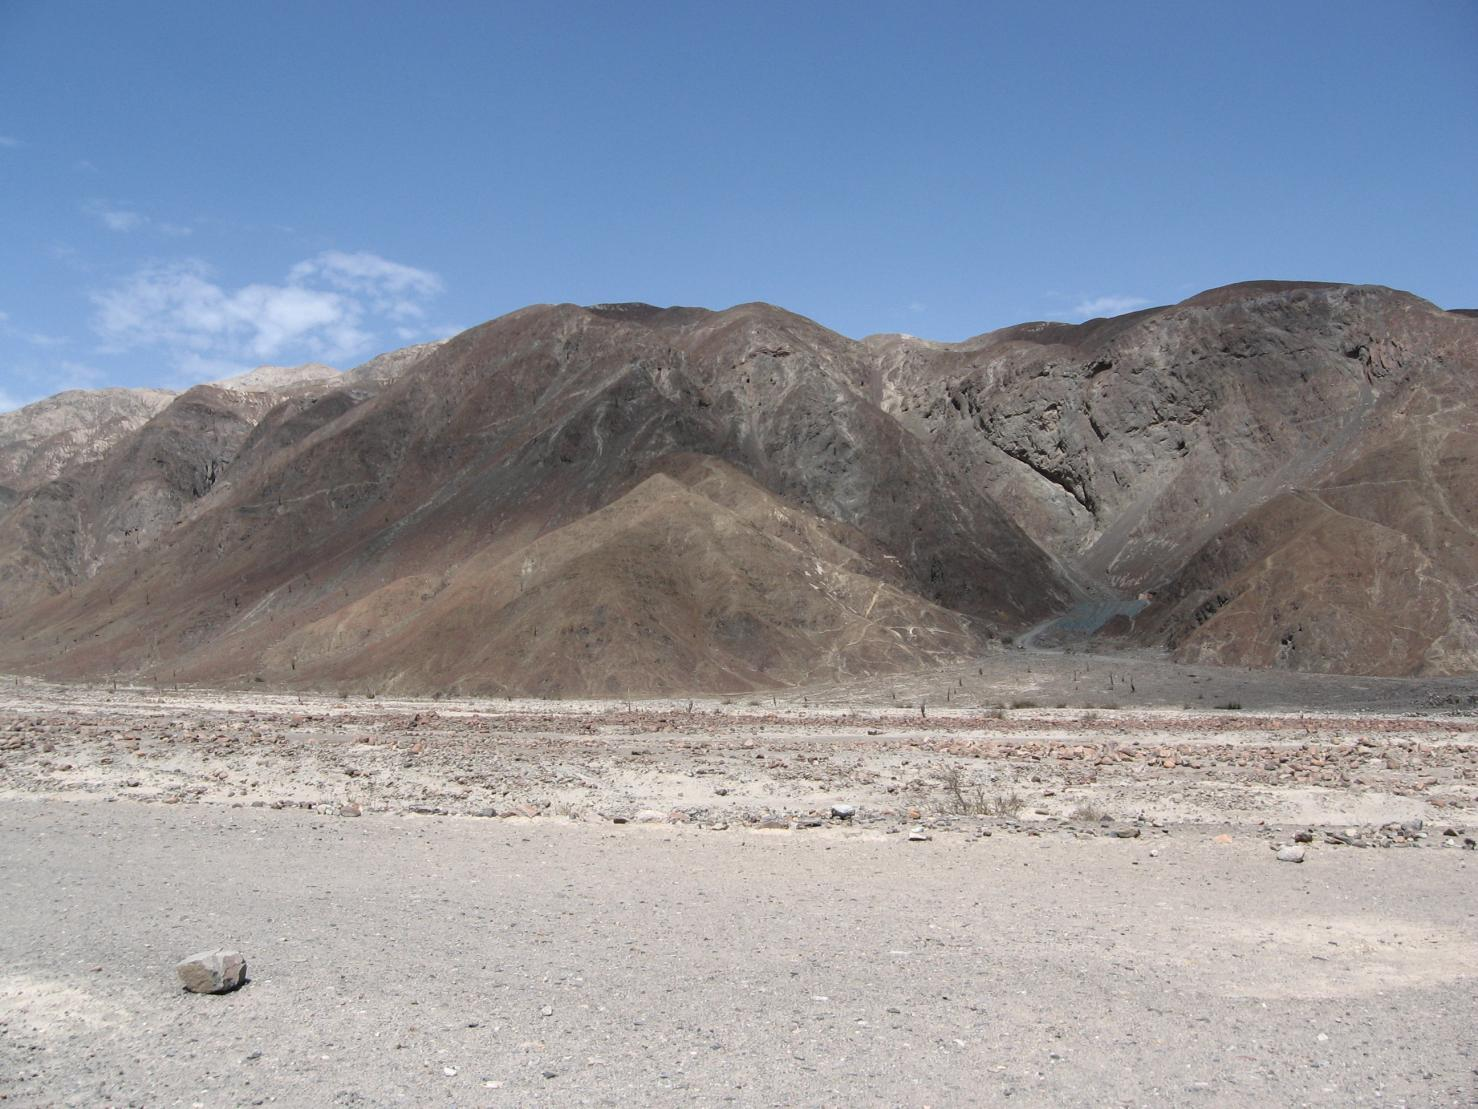 H:\Foto\Перу\Minas\15-22.02.07\YURI\IMG_0086.JPG